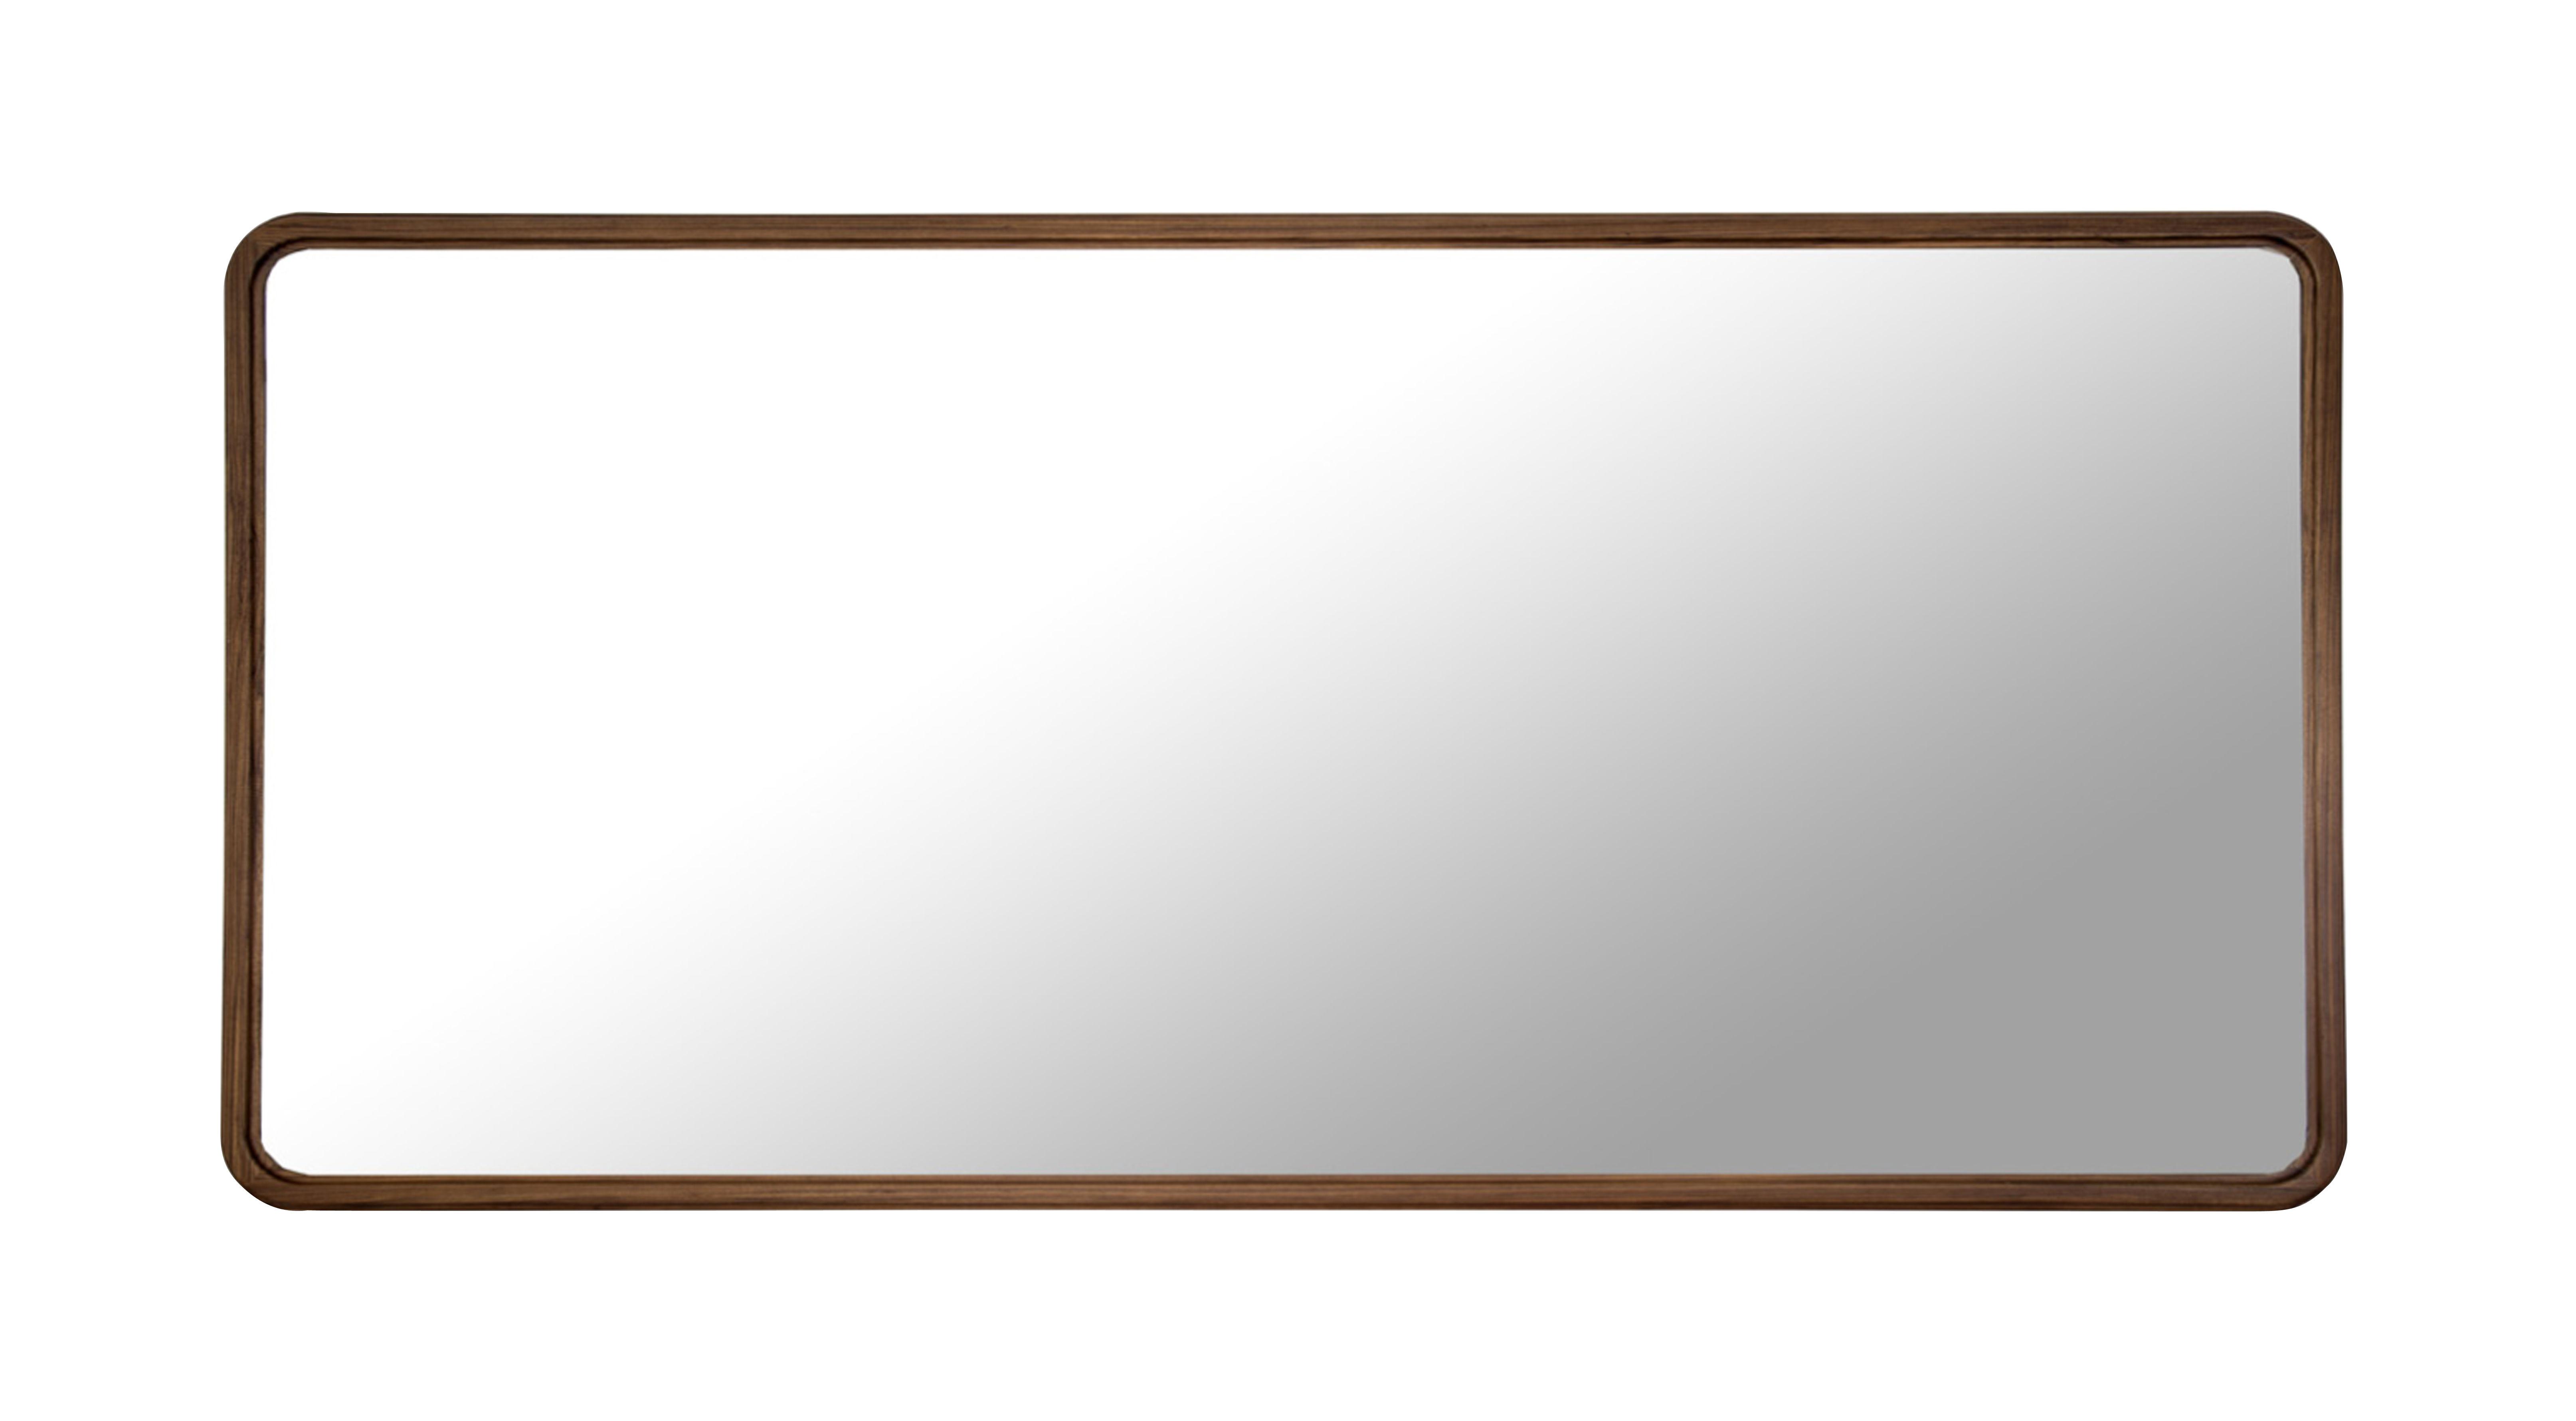 Miroir mural haussmann noyer 200 x 100 cm noyer - Miroir sarah lavoine ...